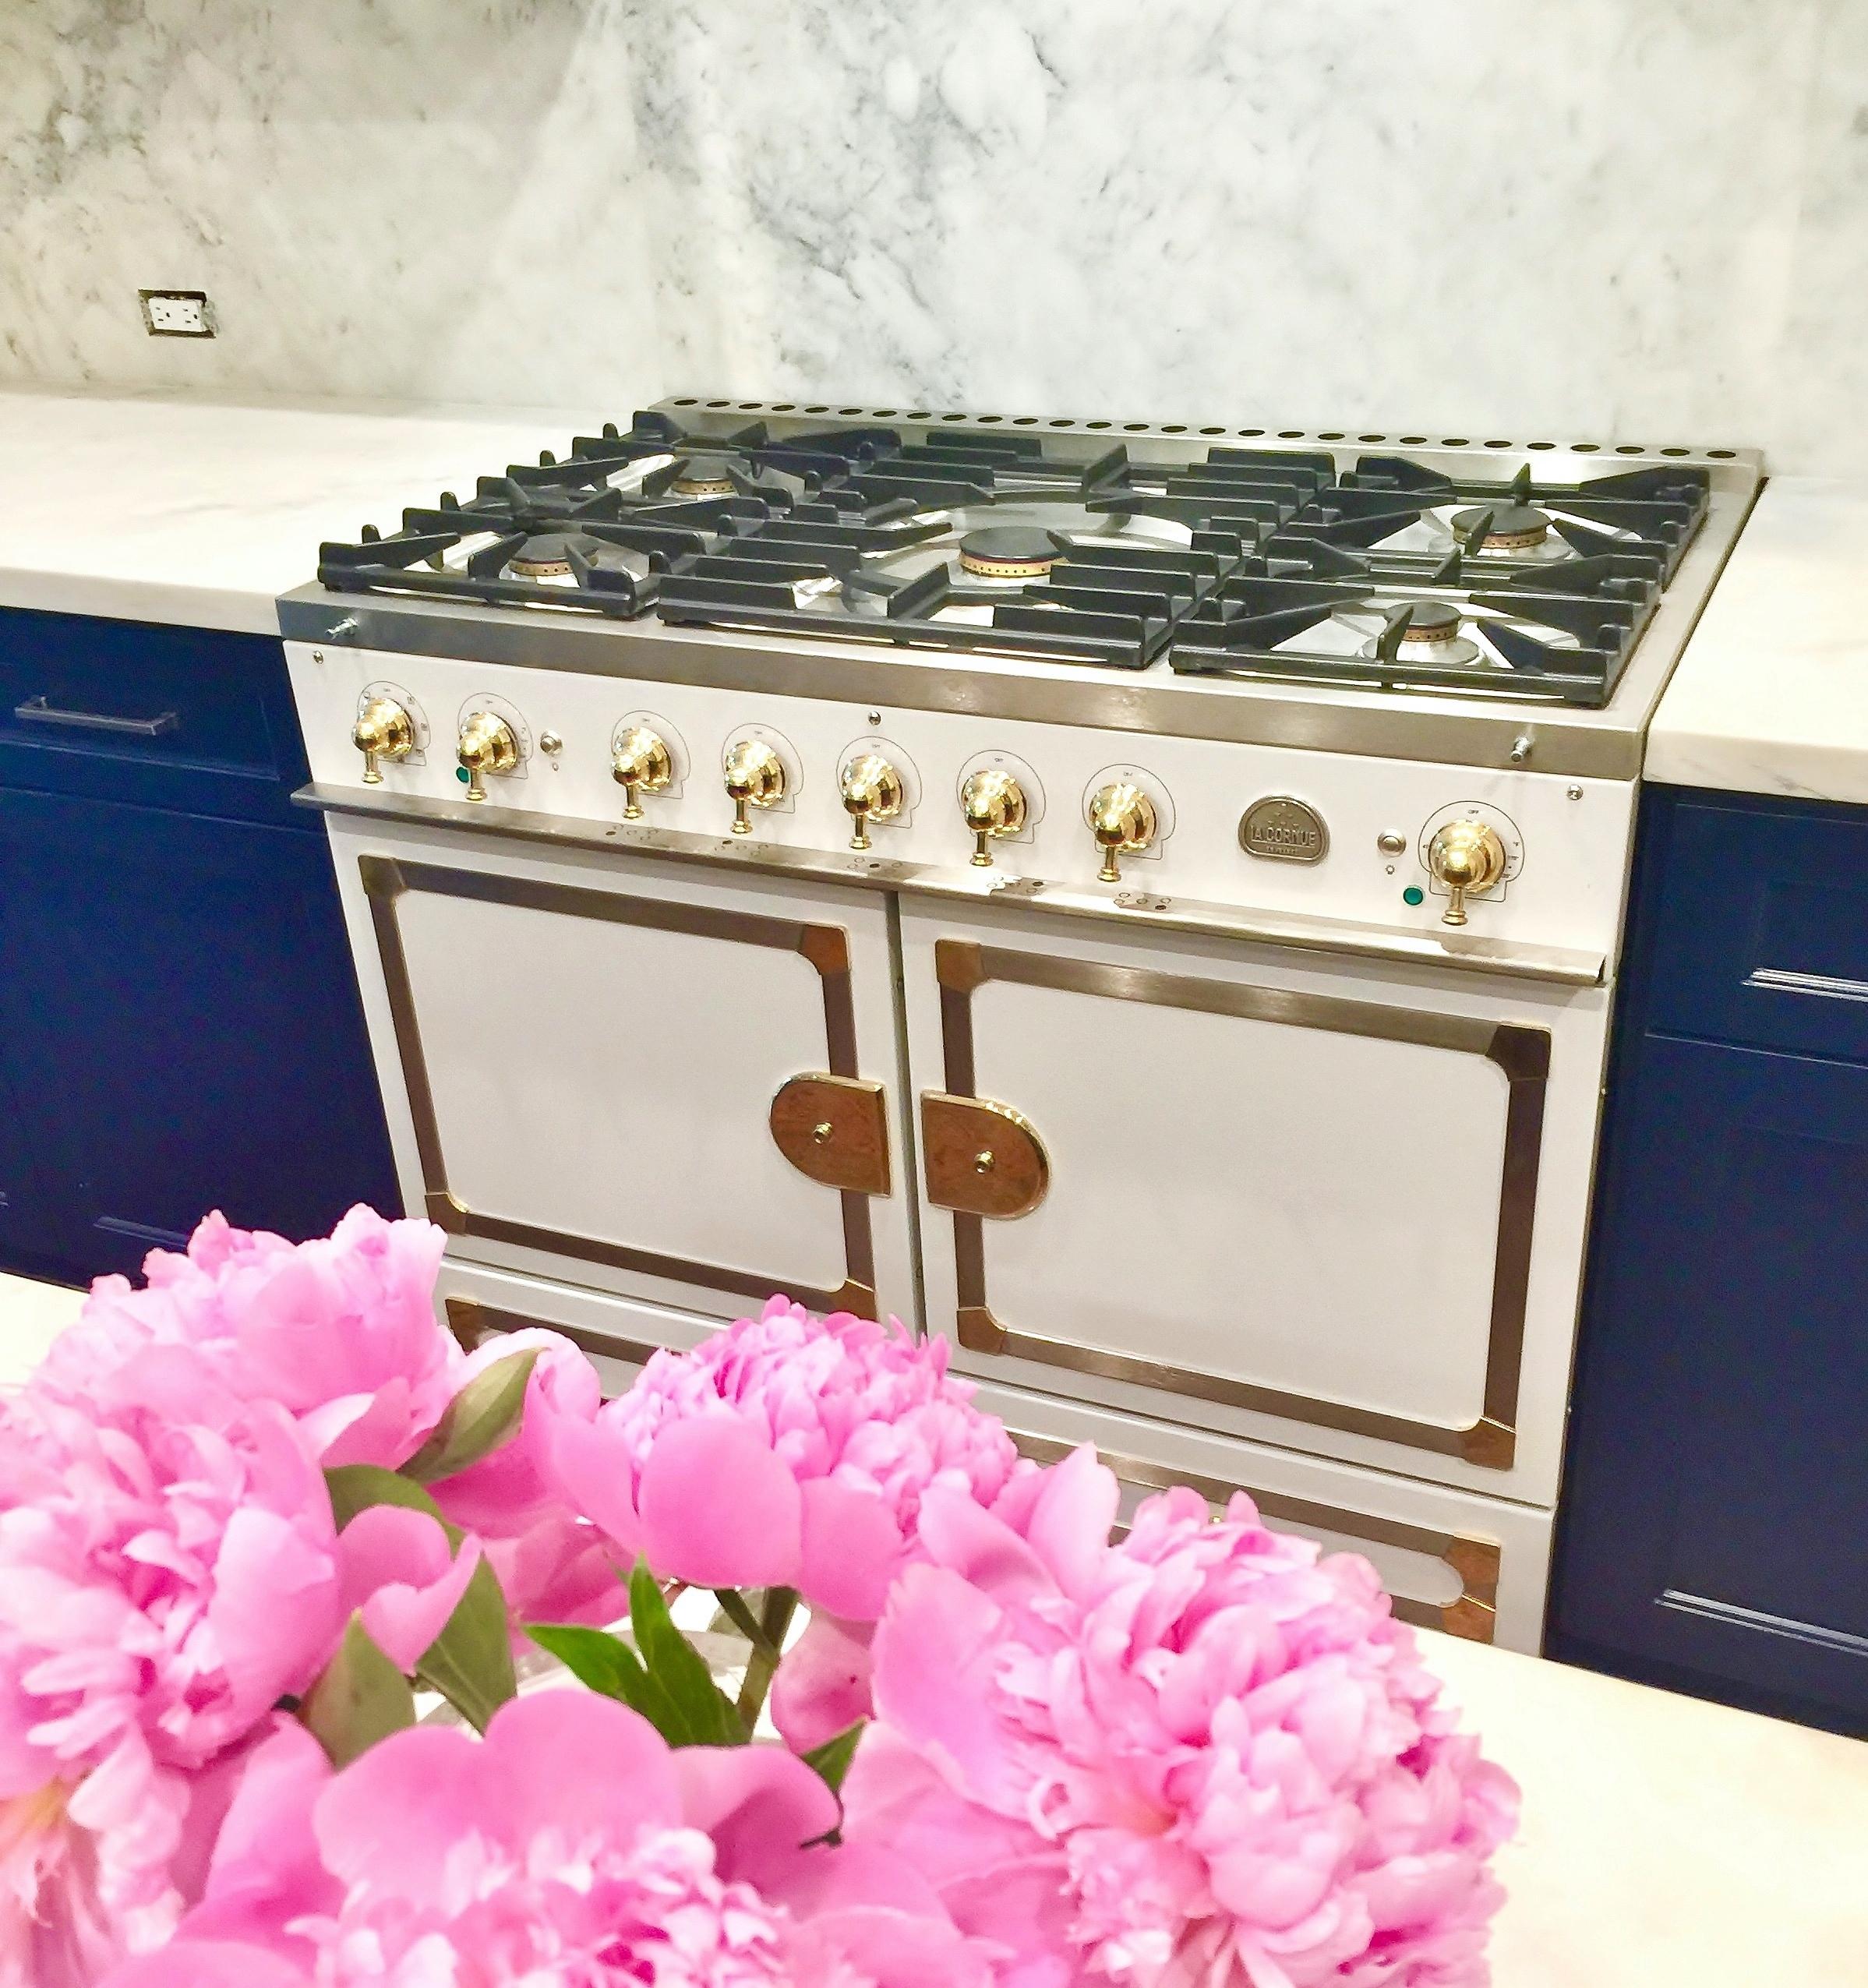 La Cornue range kitchen remodel